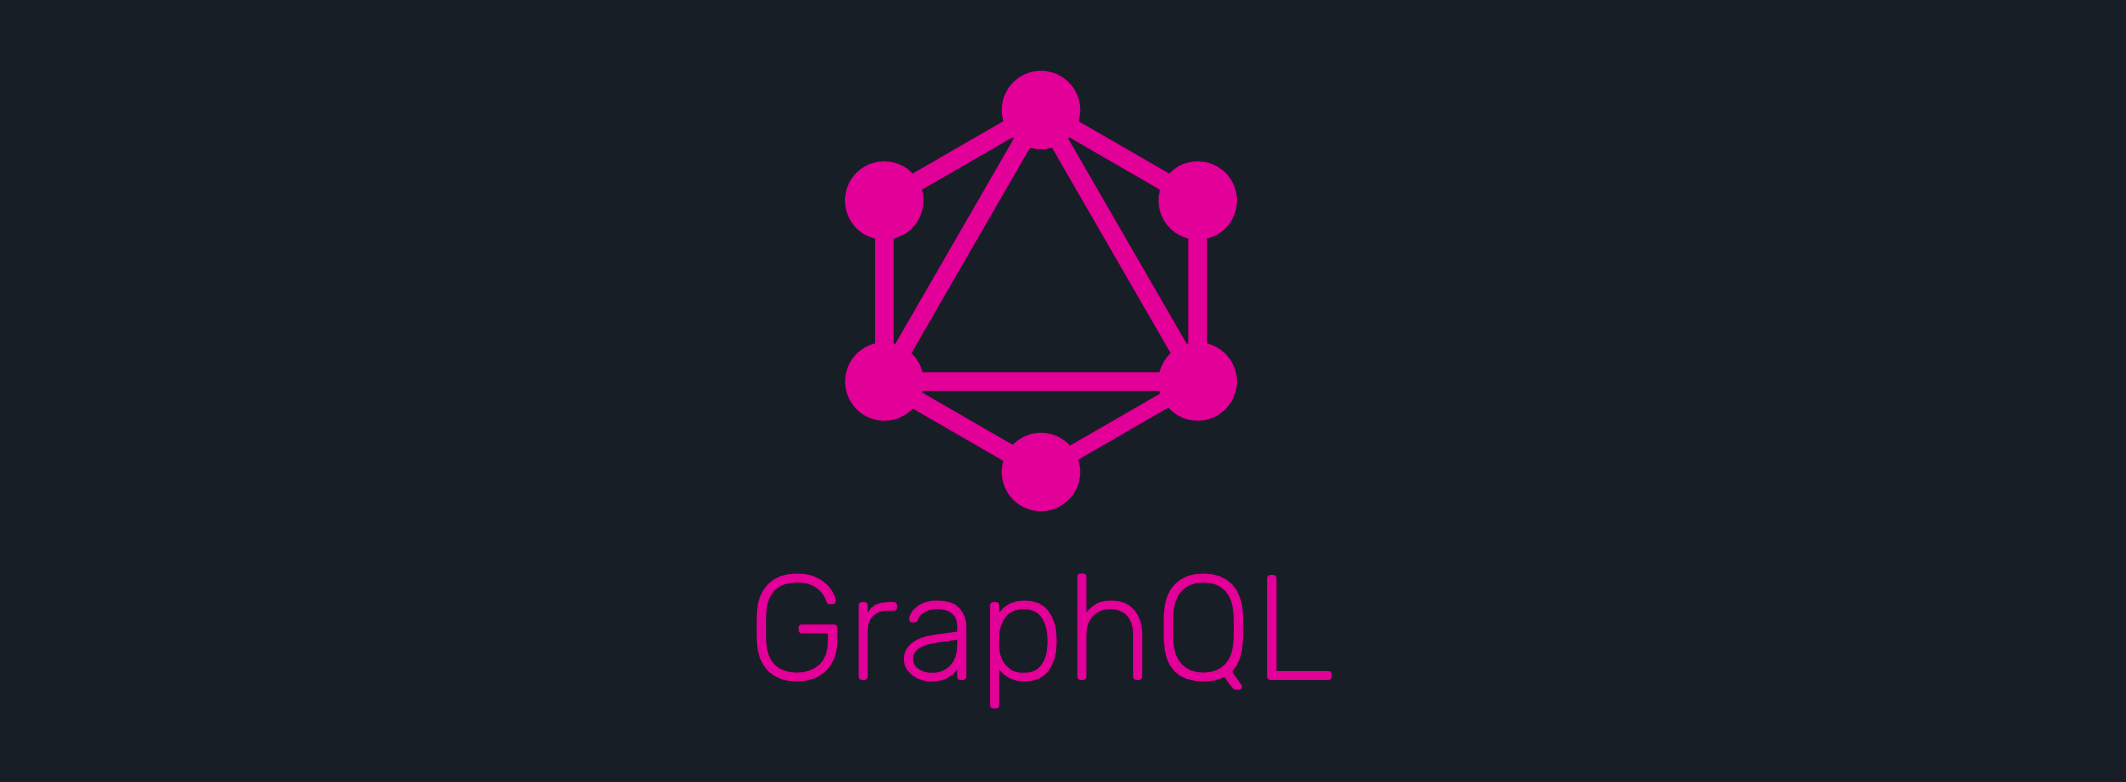 GraphQL - asap developers is a San Francisco Python Company